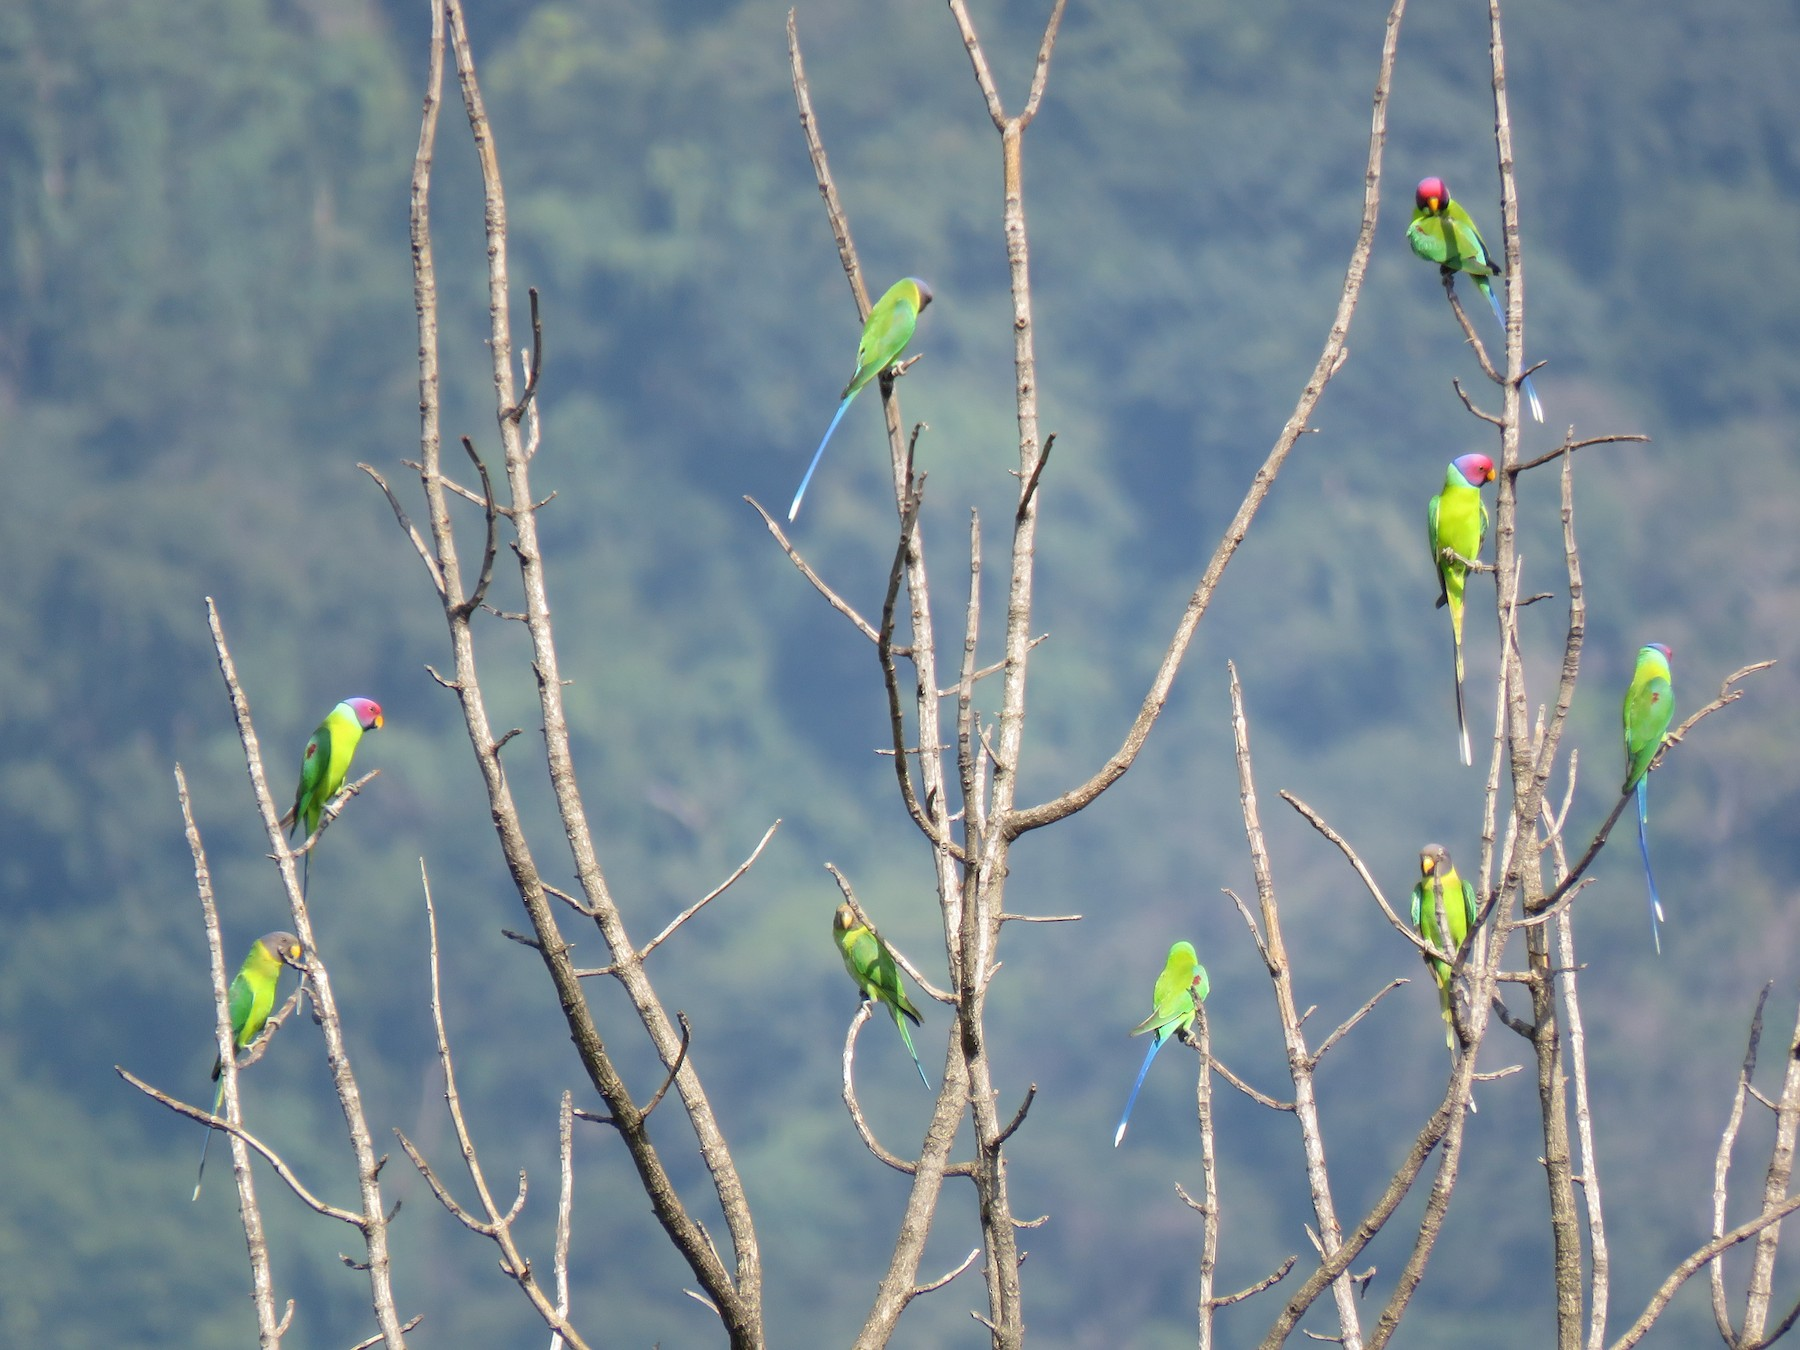 Plum-headed Parakeet - Selvaganesh K